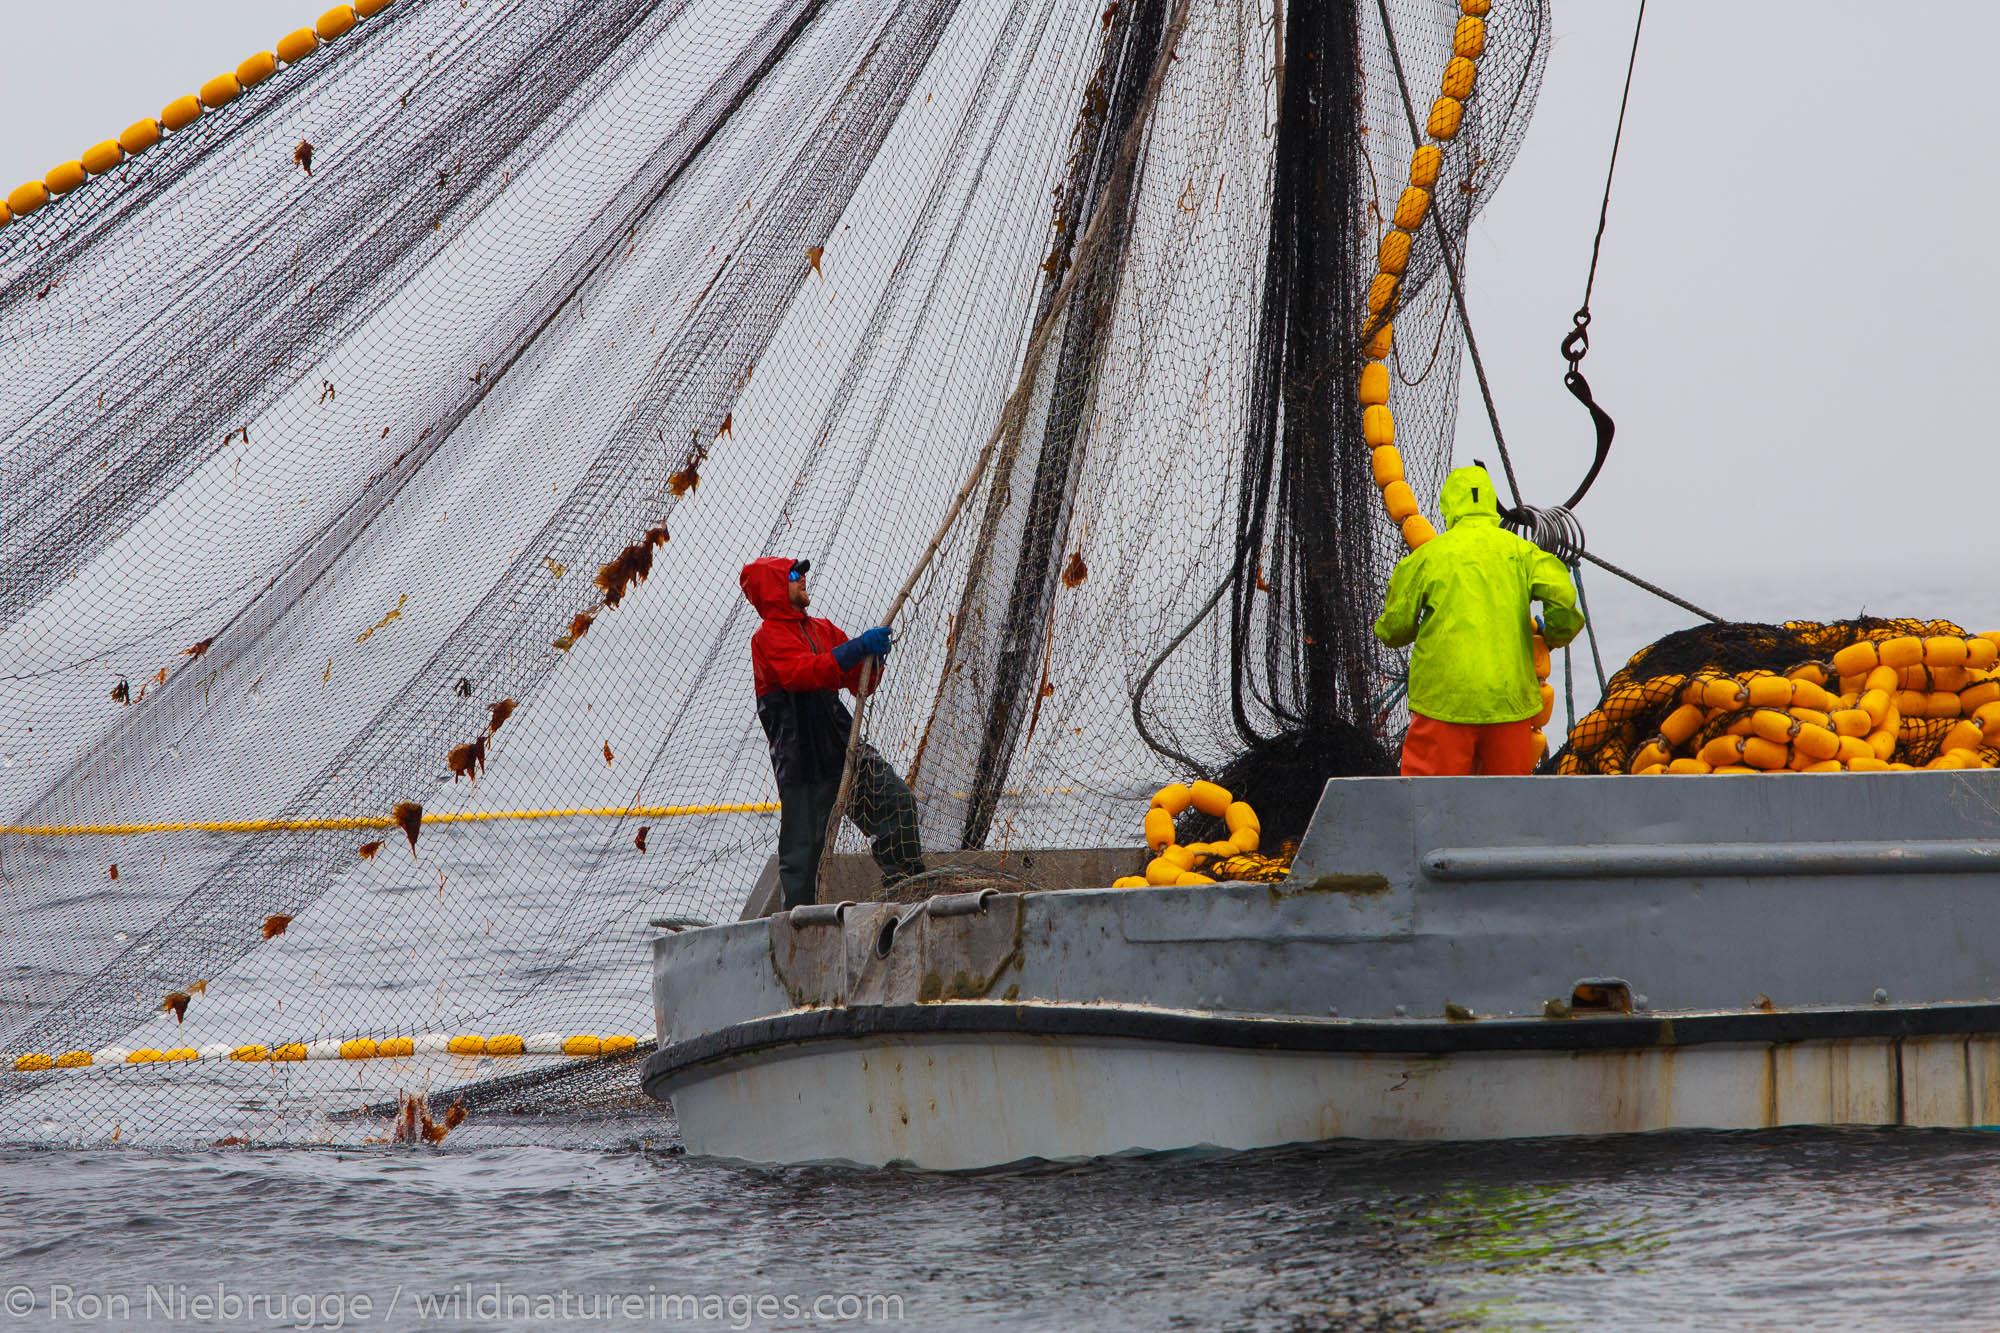 Commercial fishing boats salmon seining near Ketchikan, Alaska.